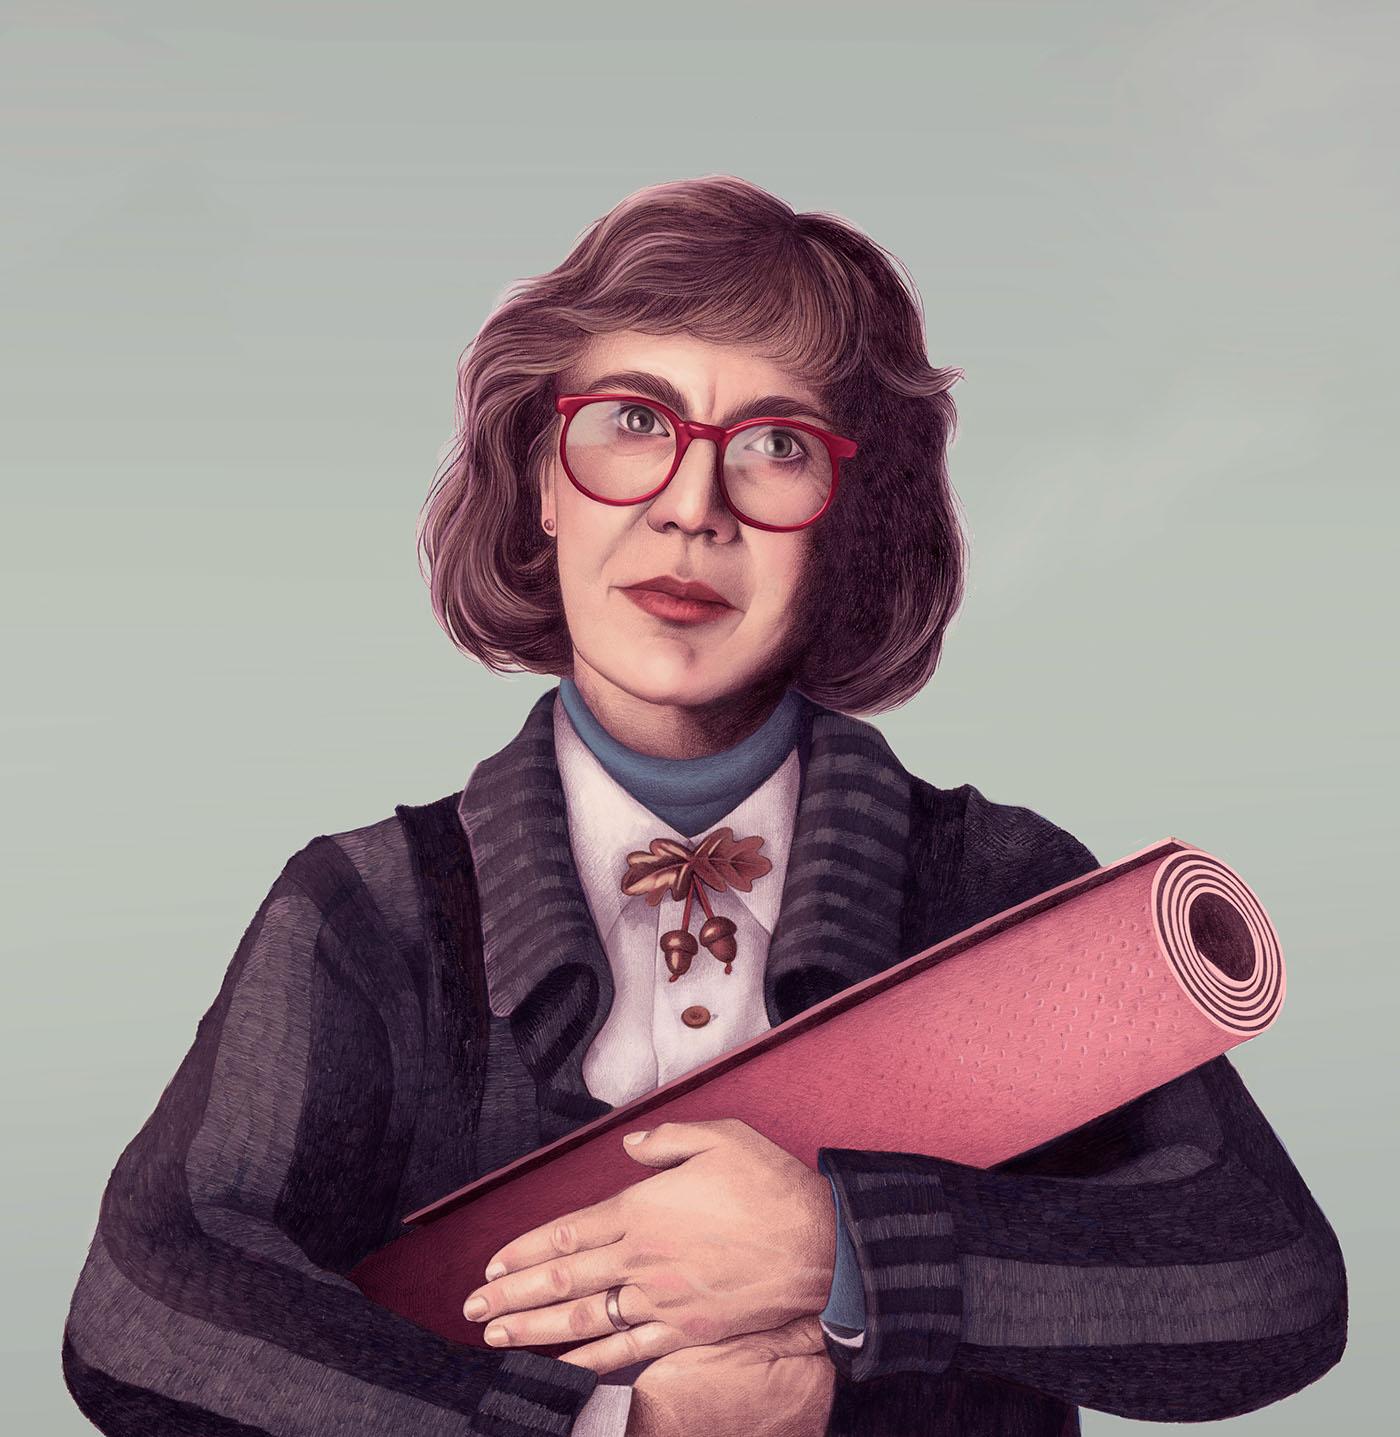 Cinema Portraits by Mercedes de Bellard